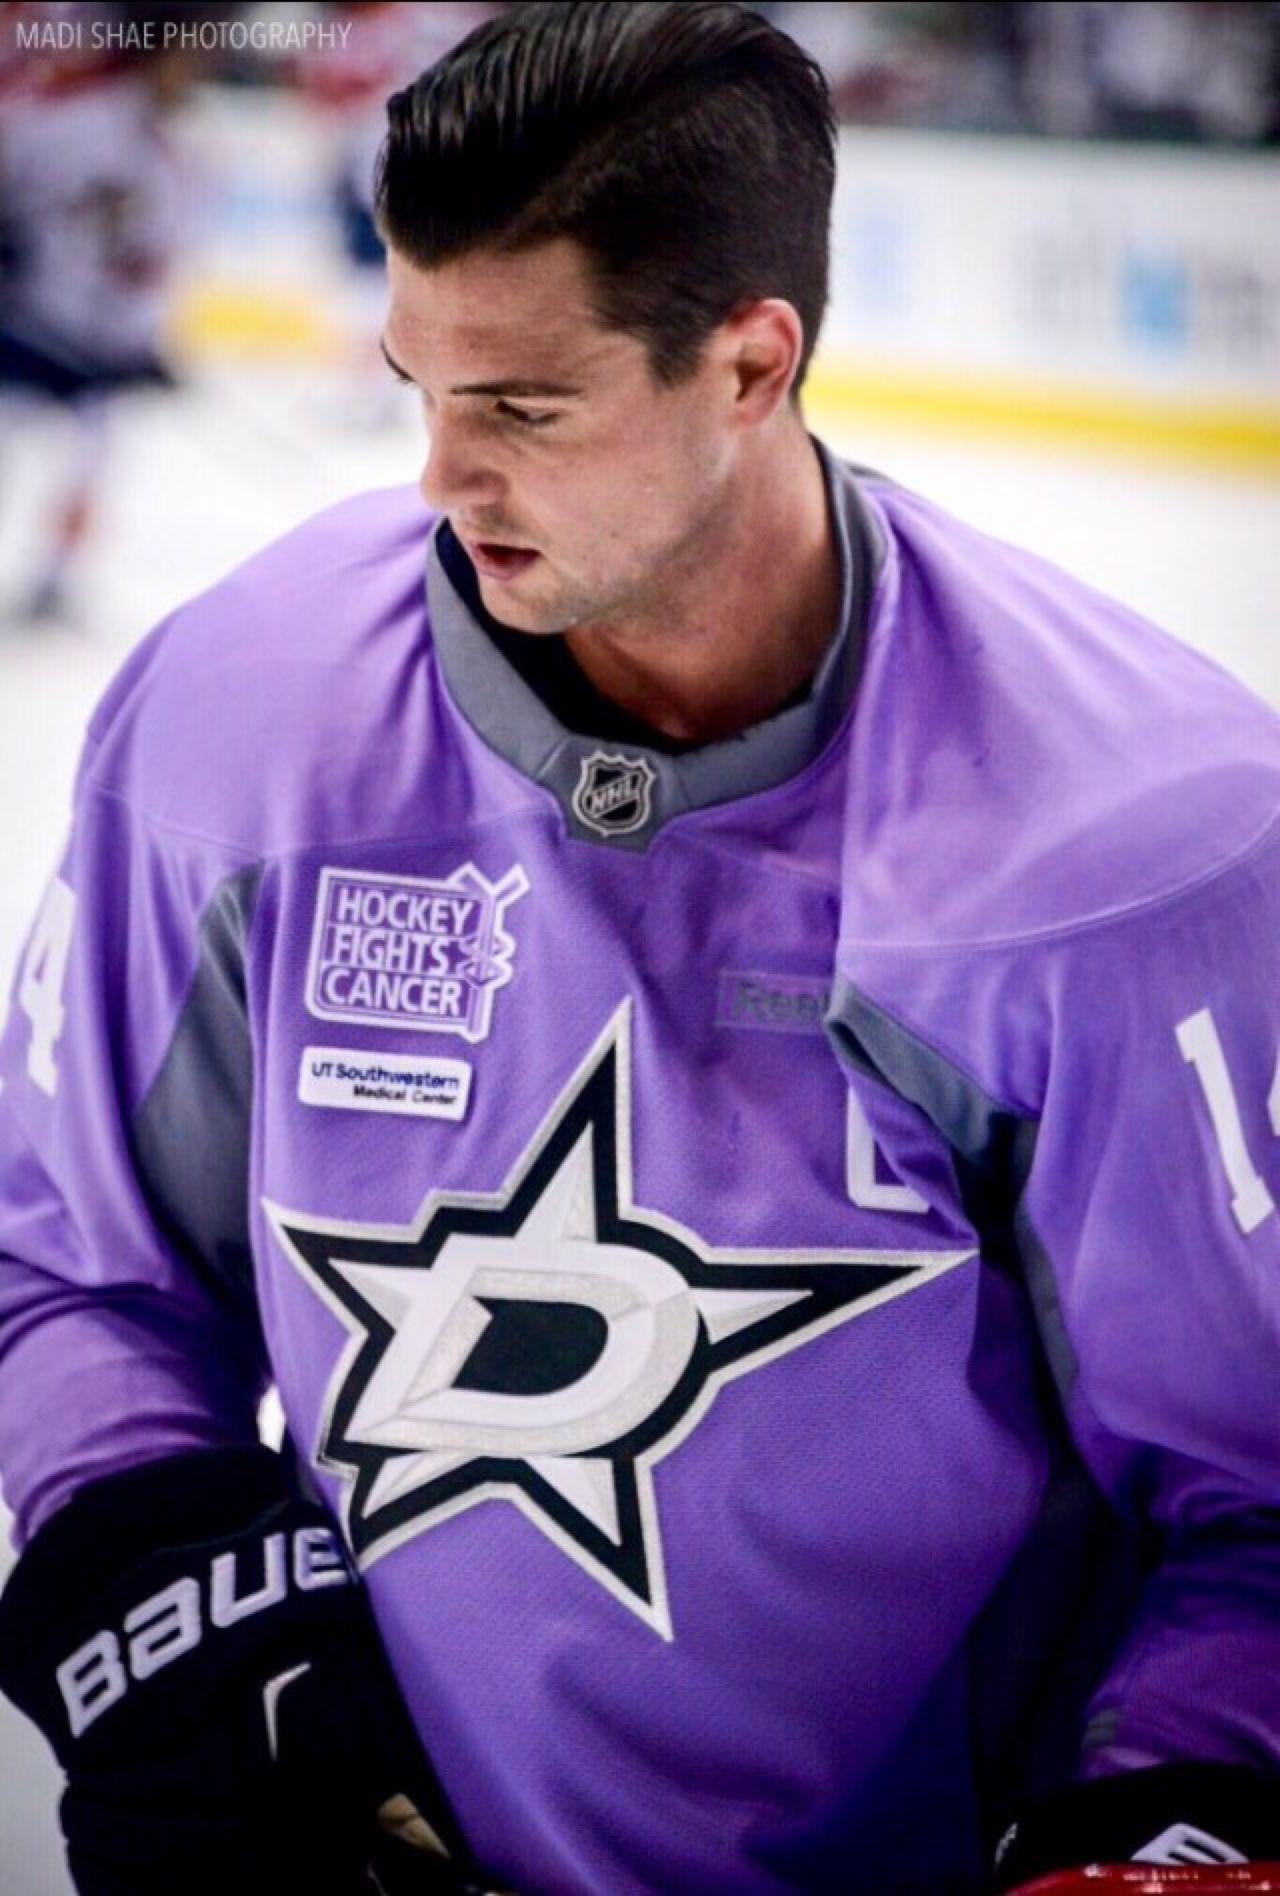 Pin By Steph On Jamie Benn Hockey Fights Dallas Stars Hockey Hot Hockey Players